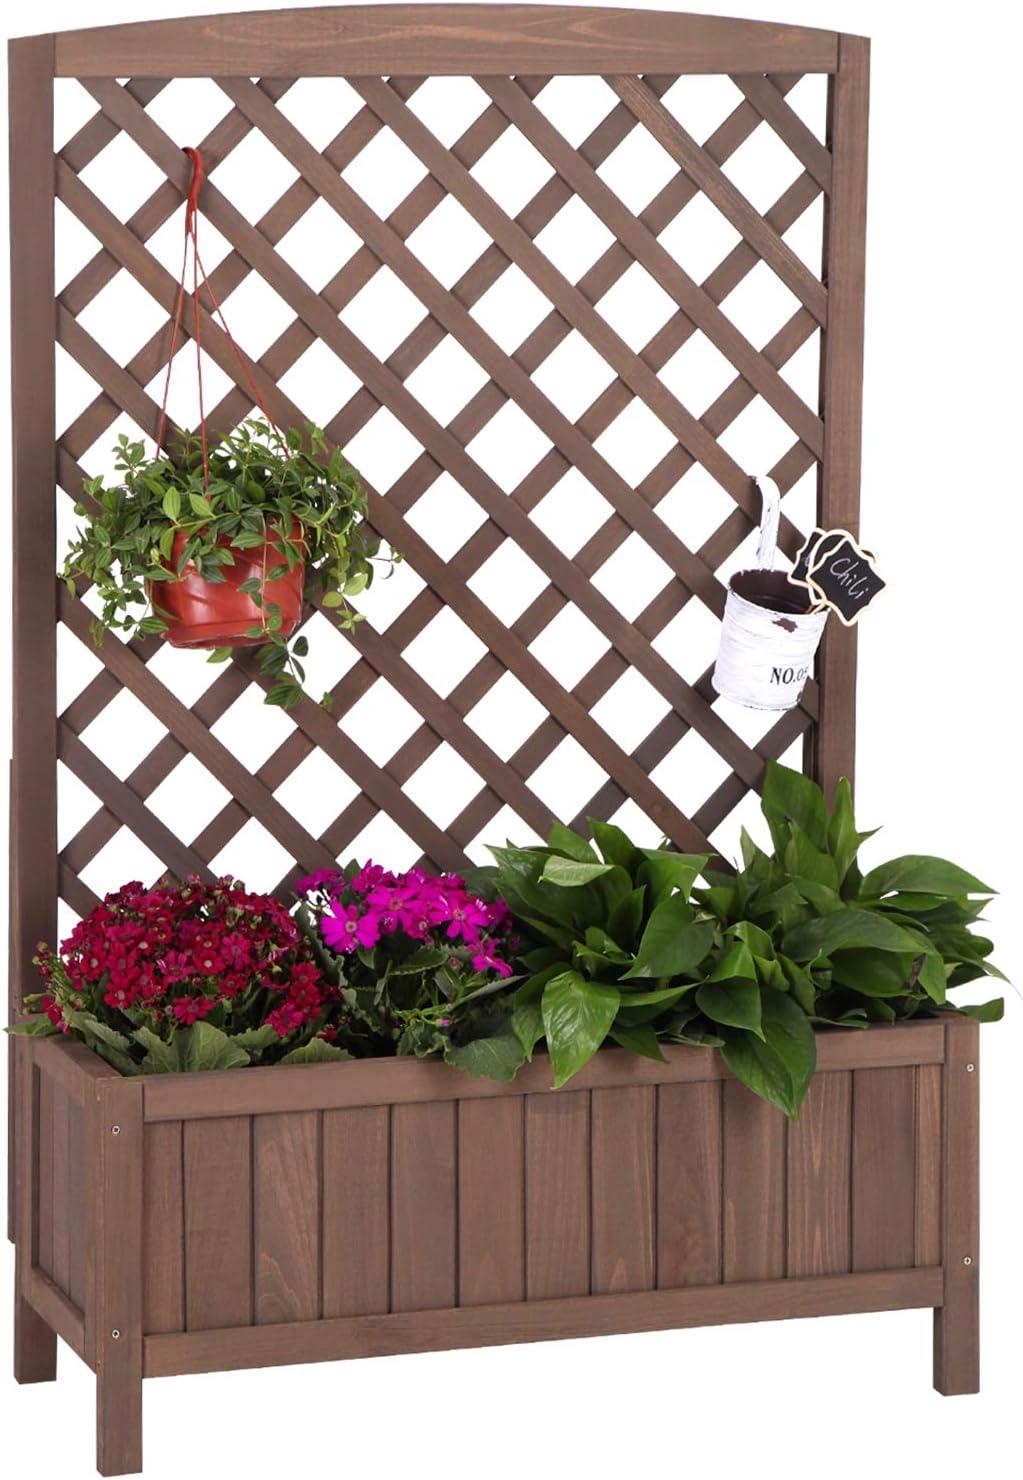 Raised Garden Bed Outdoor Planter Box with Trellis for Flower Standing Vertical Lattice Panels for Vine 31